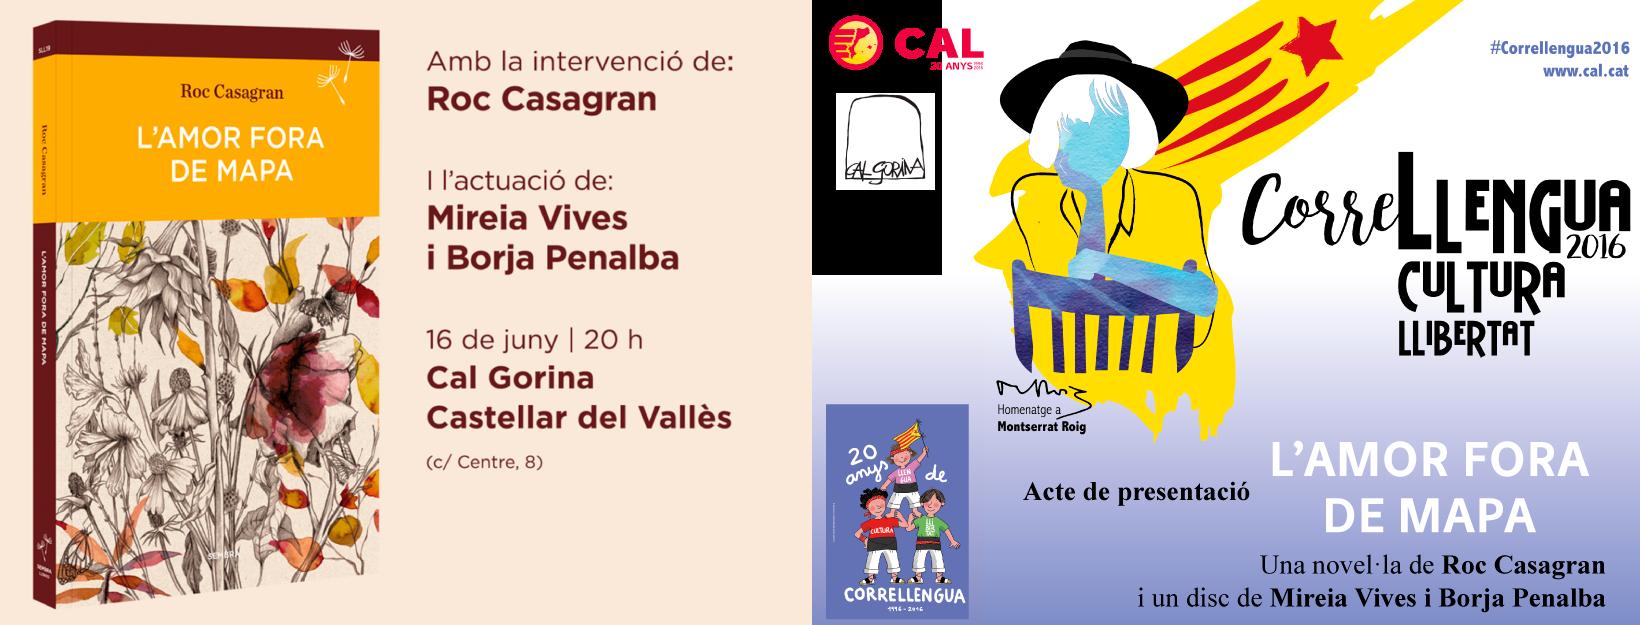 Castellar_Vallès_Amor_fora_mapa